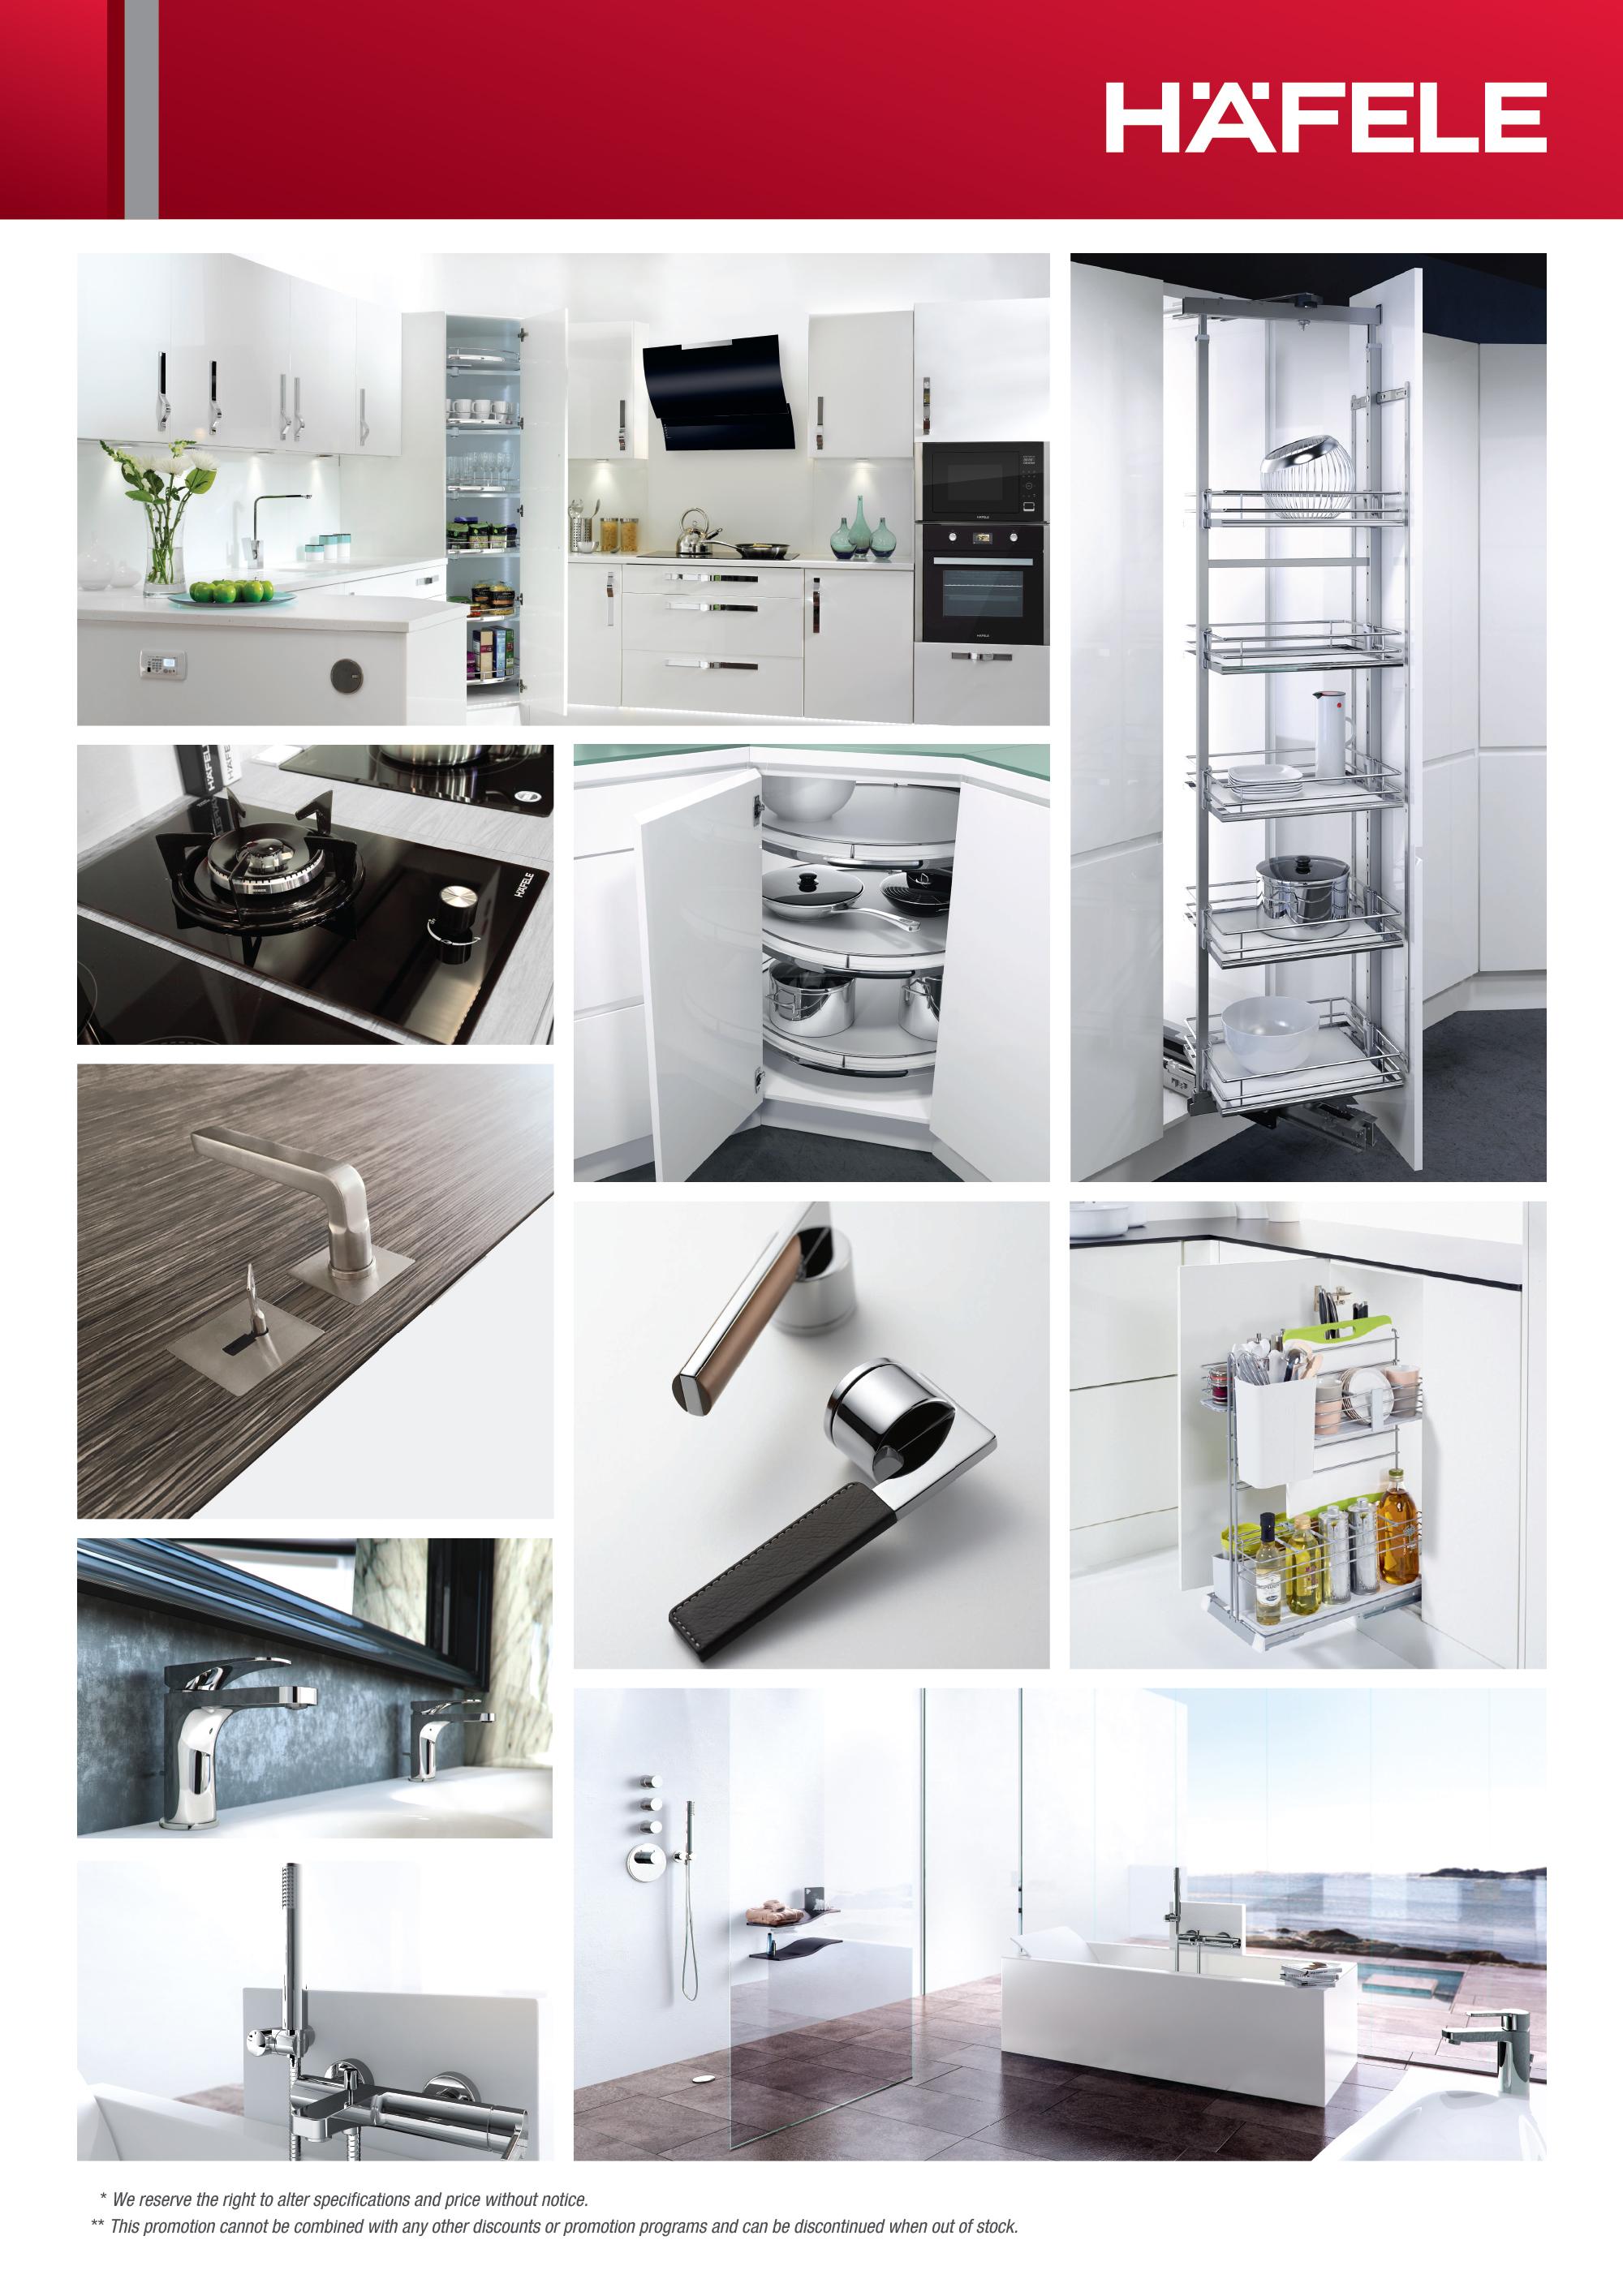 Warehouse Kitchen Appliances Gorenje Black Hafele Hafele Kitchen Appliances Phidesignus